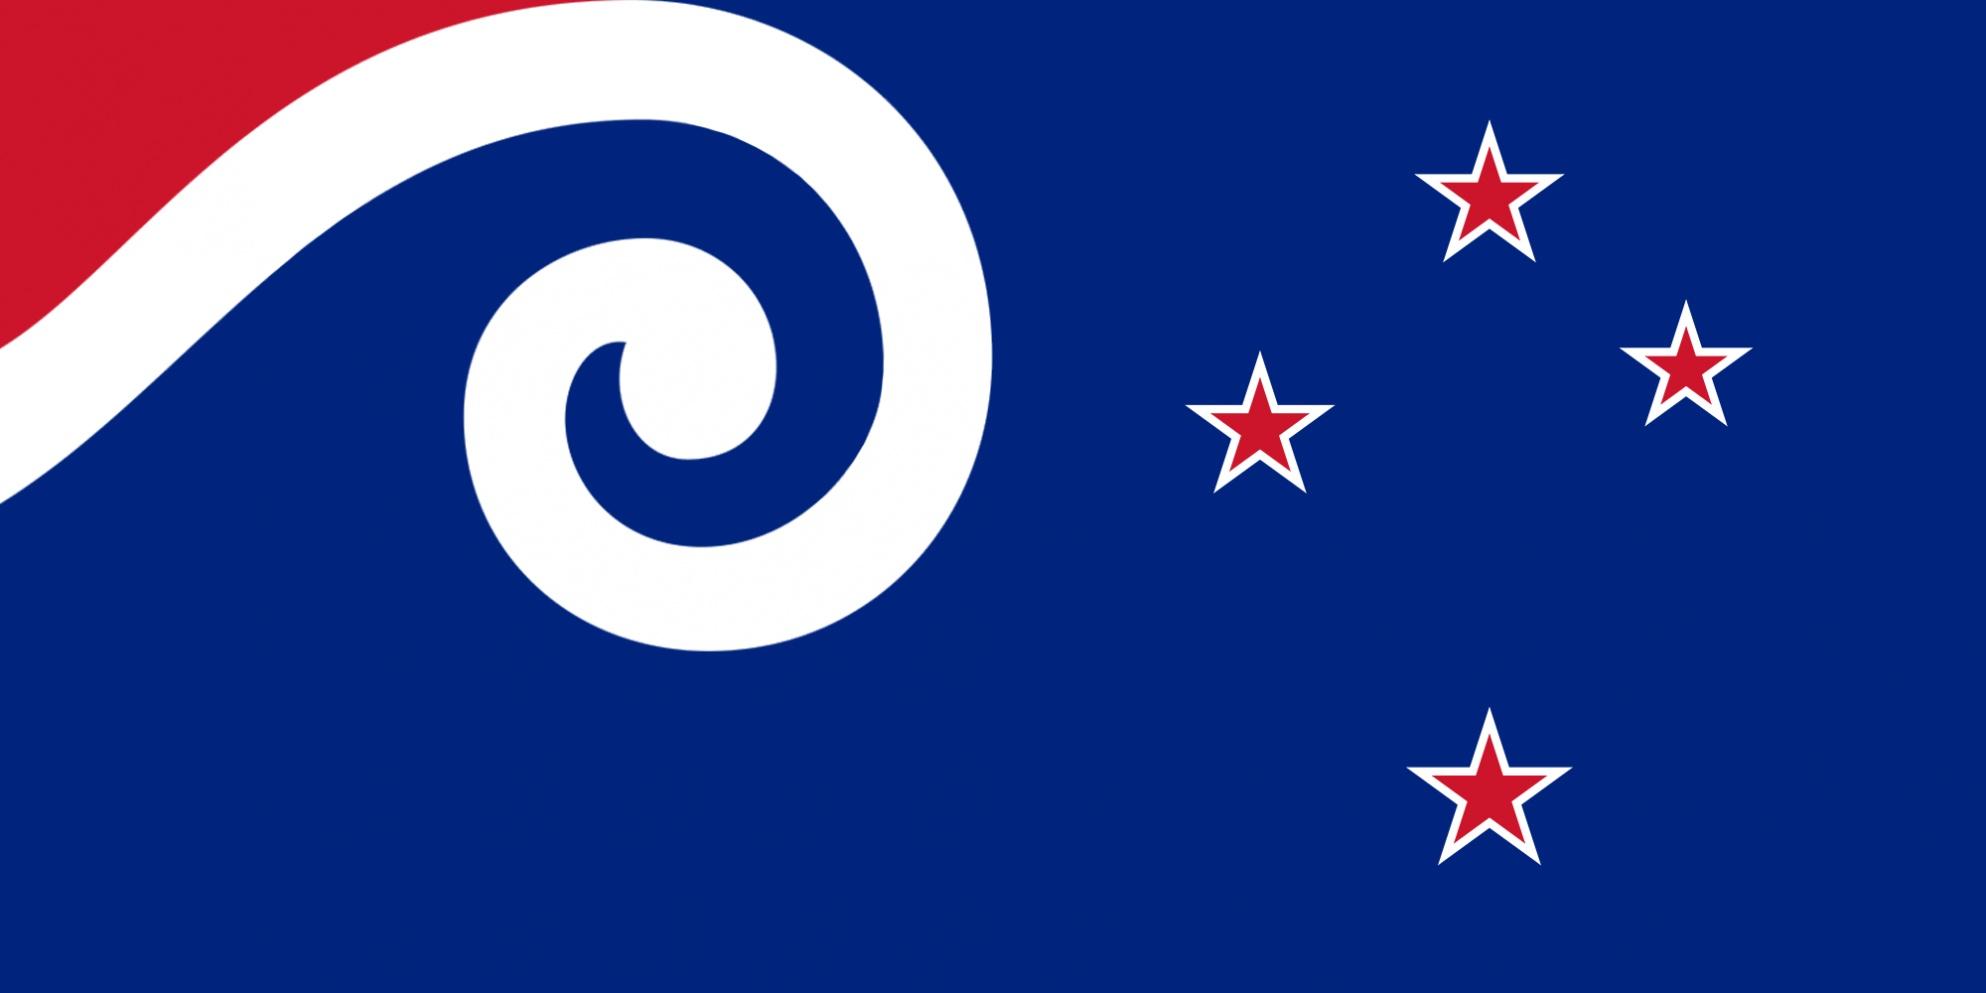 File:NZ flag design Koru and Stars by Alan Tran.jpg - Wikimedia Commons